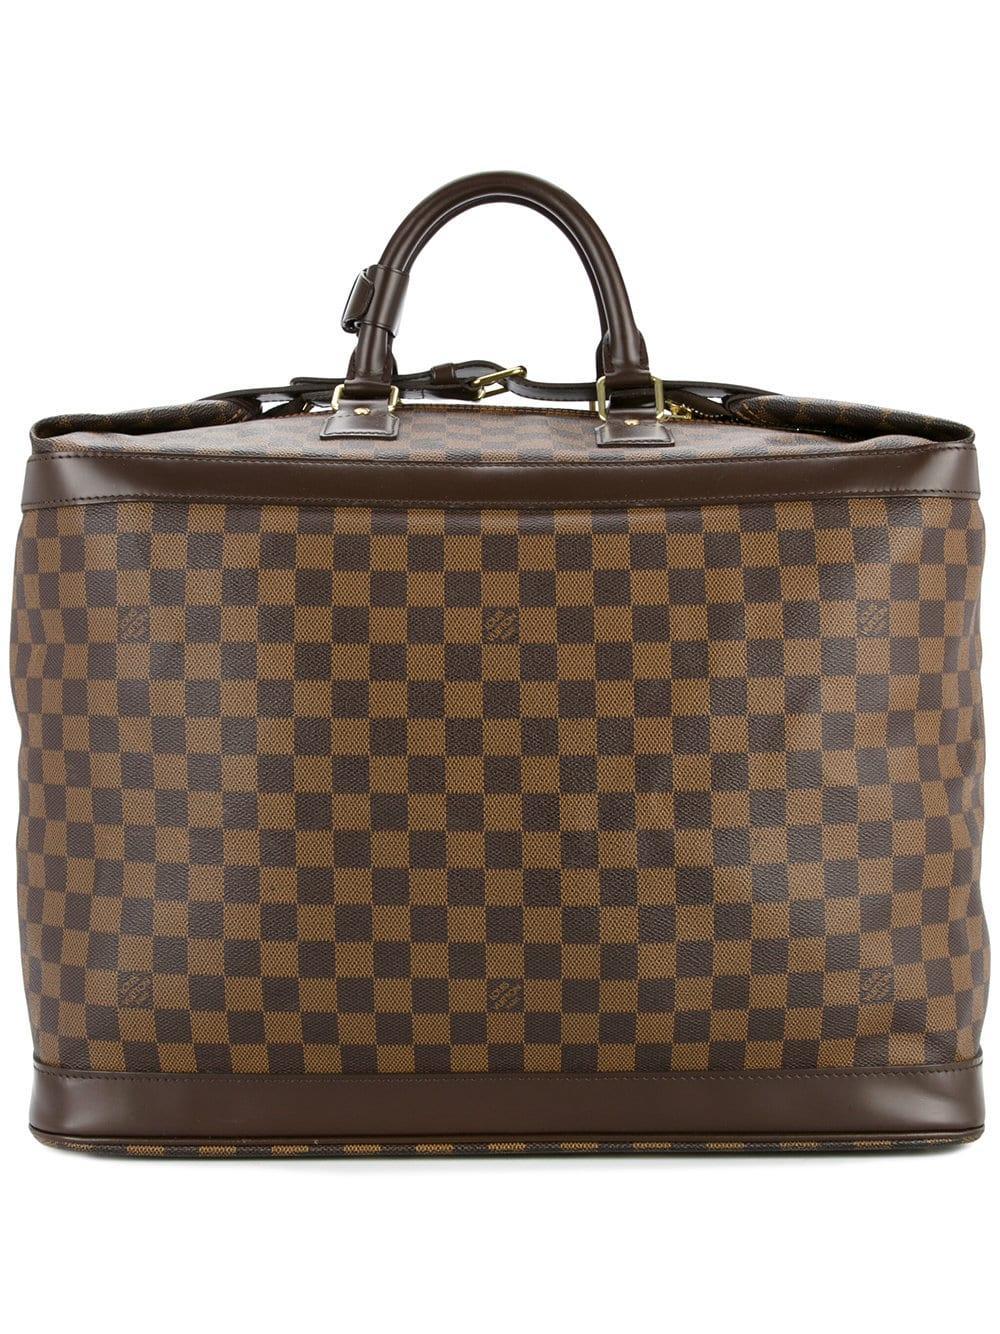 10323163fba4d Louis Vuitton Vintage Damier Ebene Luggage Bag - Farfetch In Brown ...